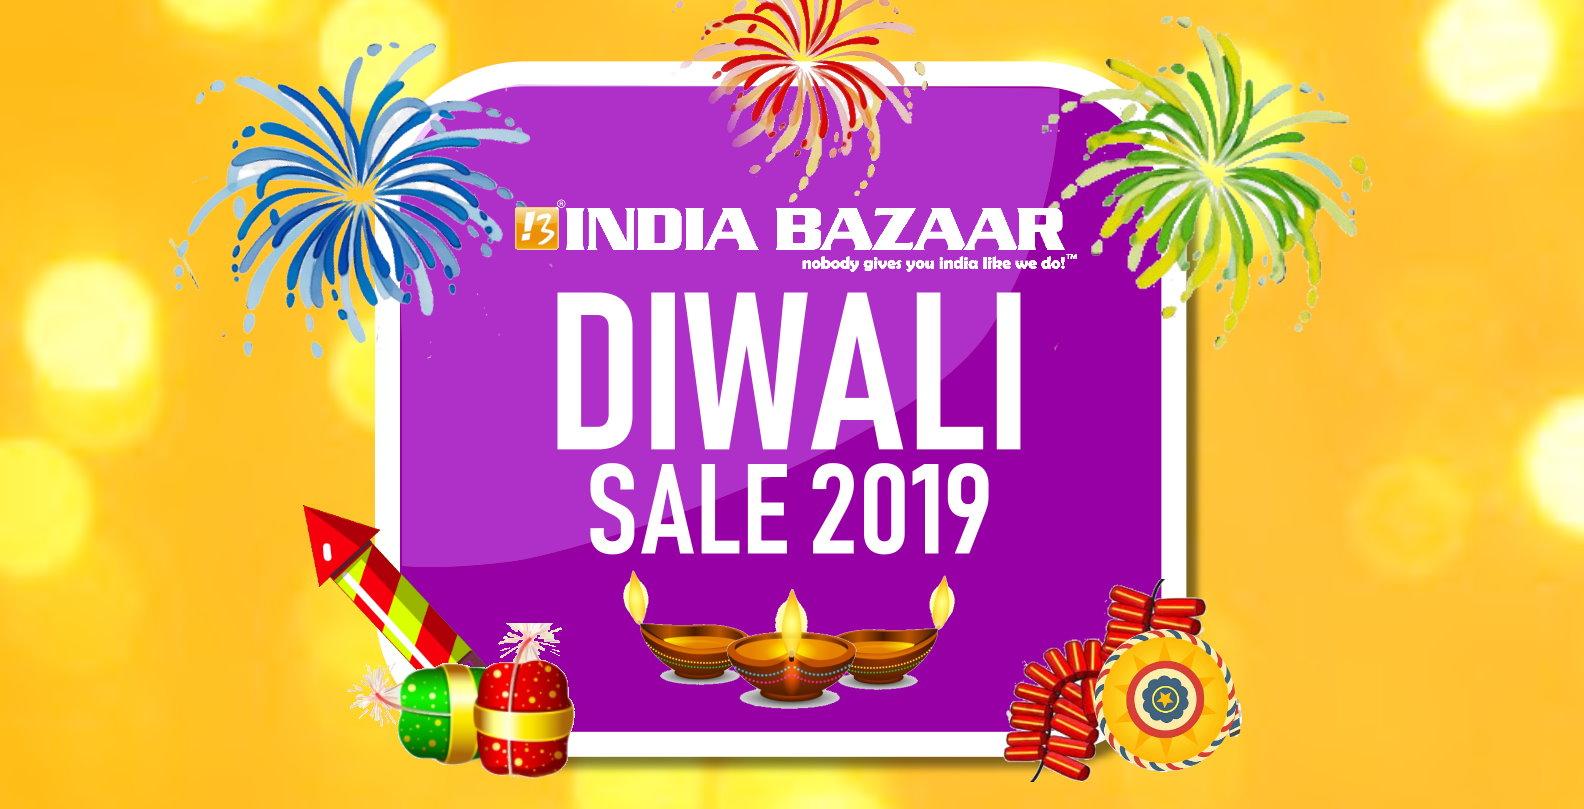 Diwali Sale 2019